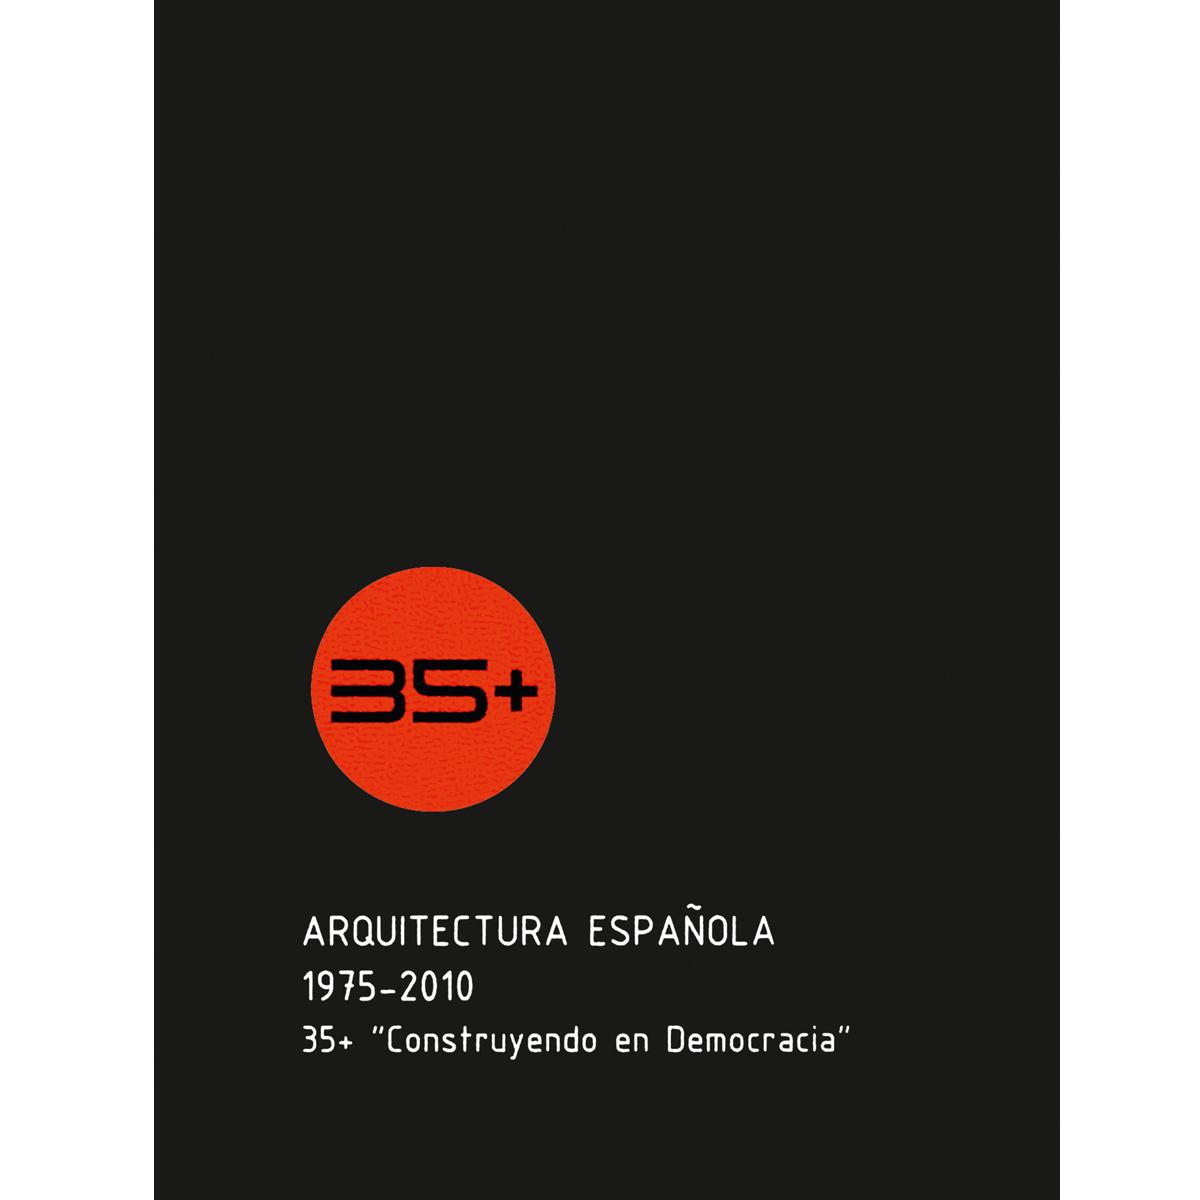 Arquitectura española, 1975-2010